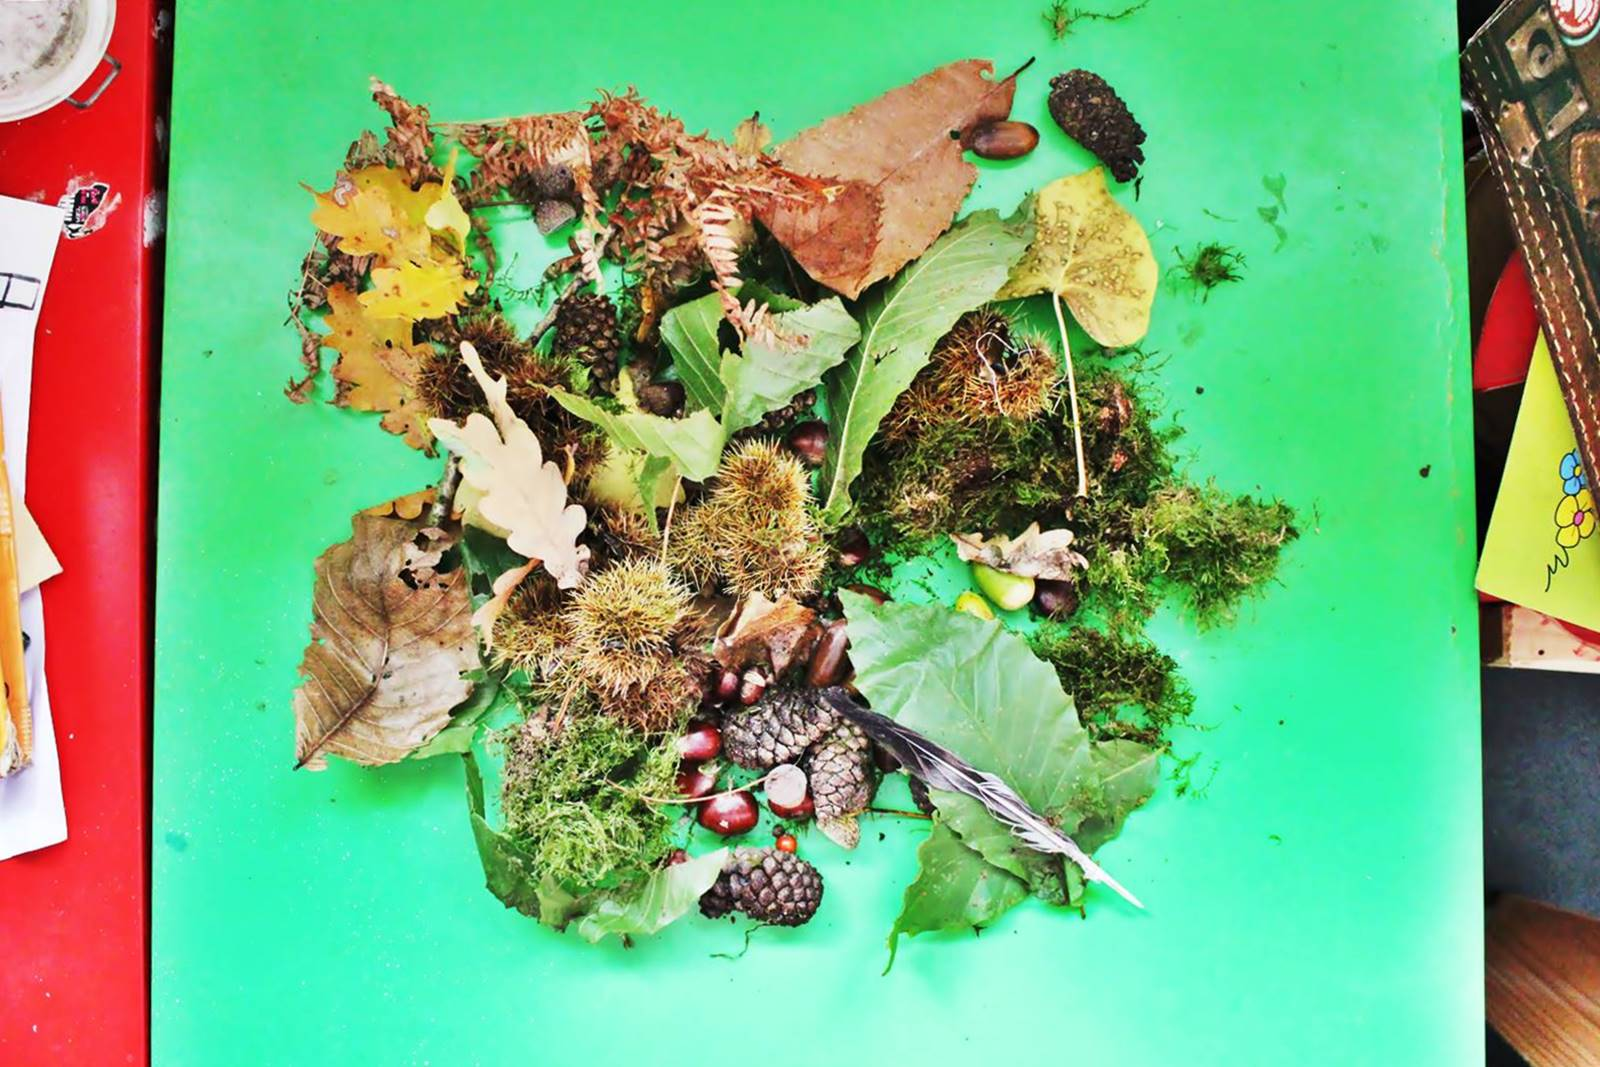 Table des saisons steiner waldorf ief homescooling ecole maison automne 3